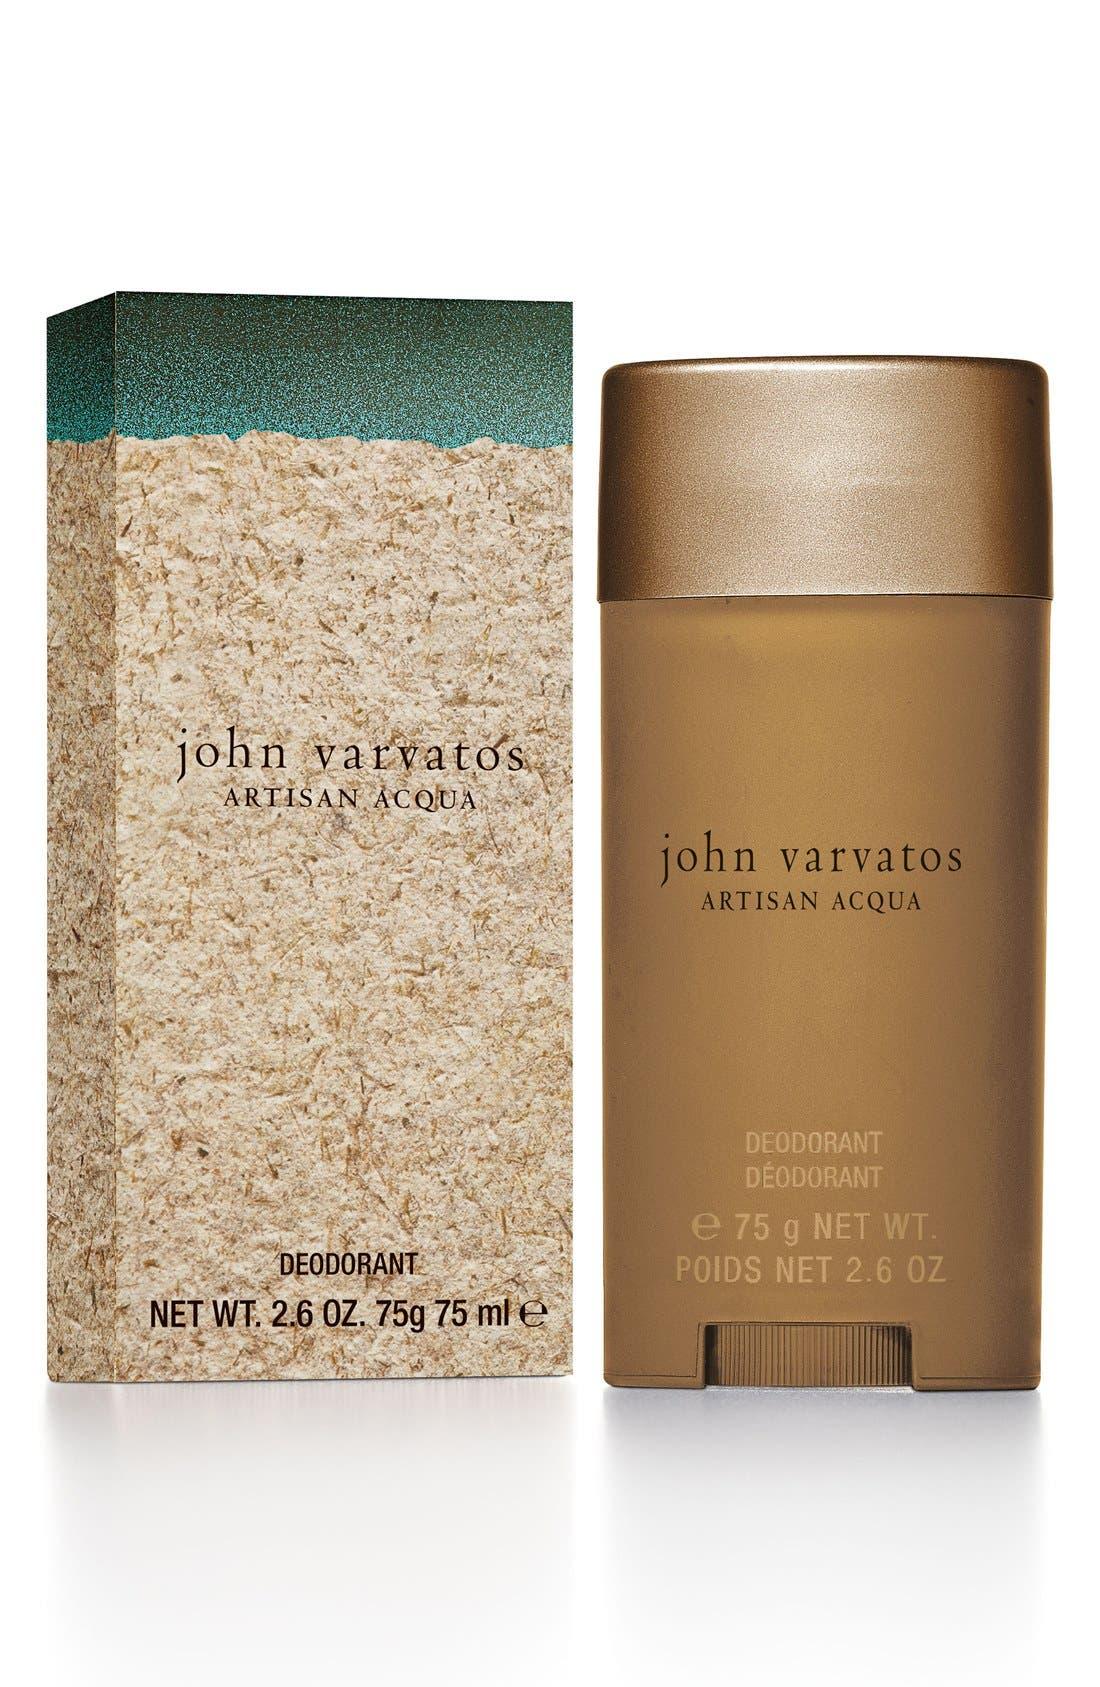 John Varvatos 'Artisan Acqua' Deodorant